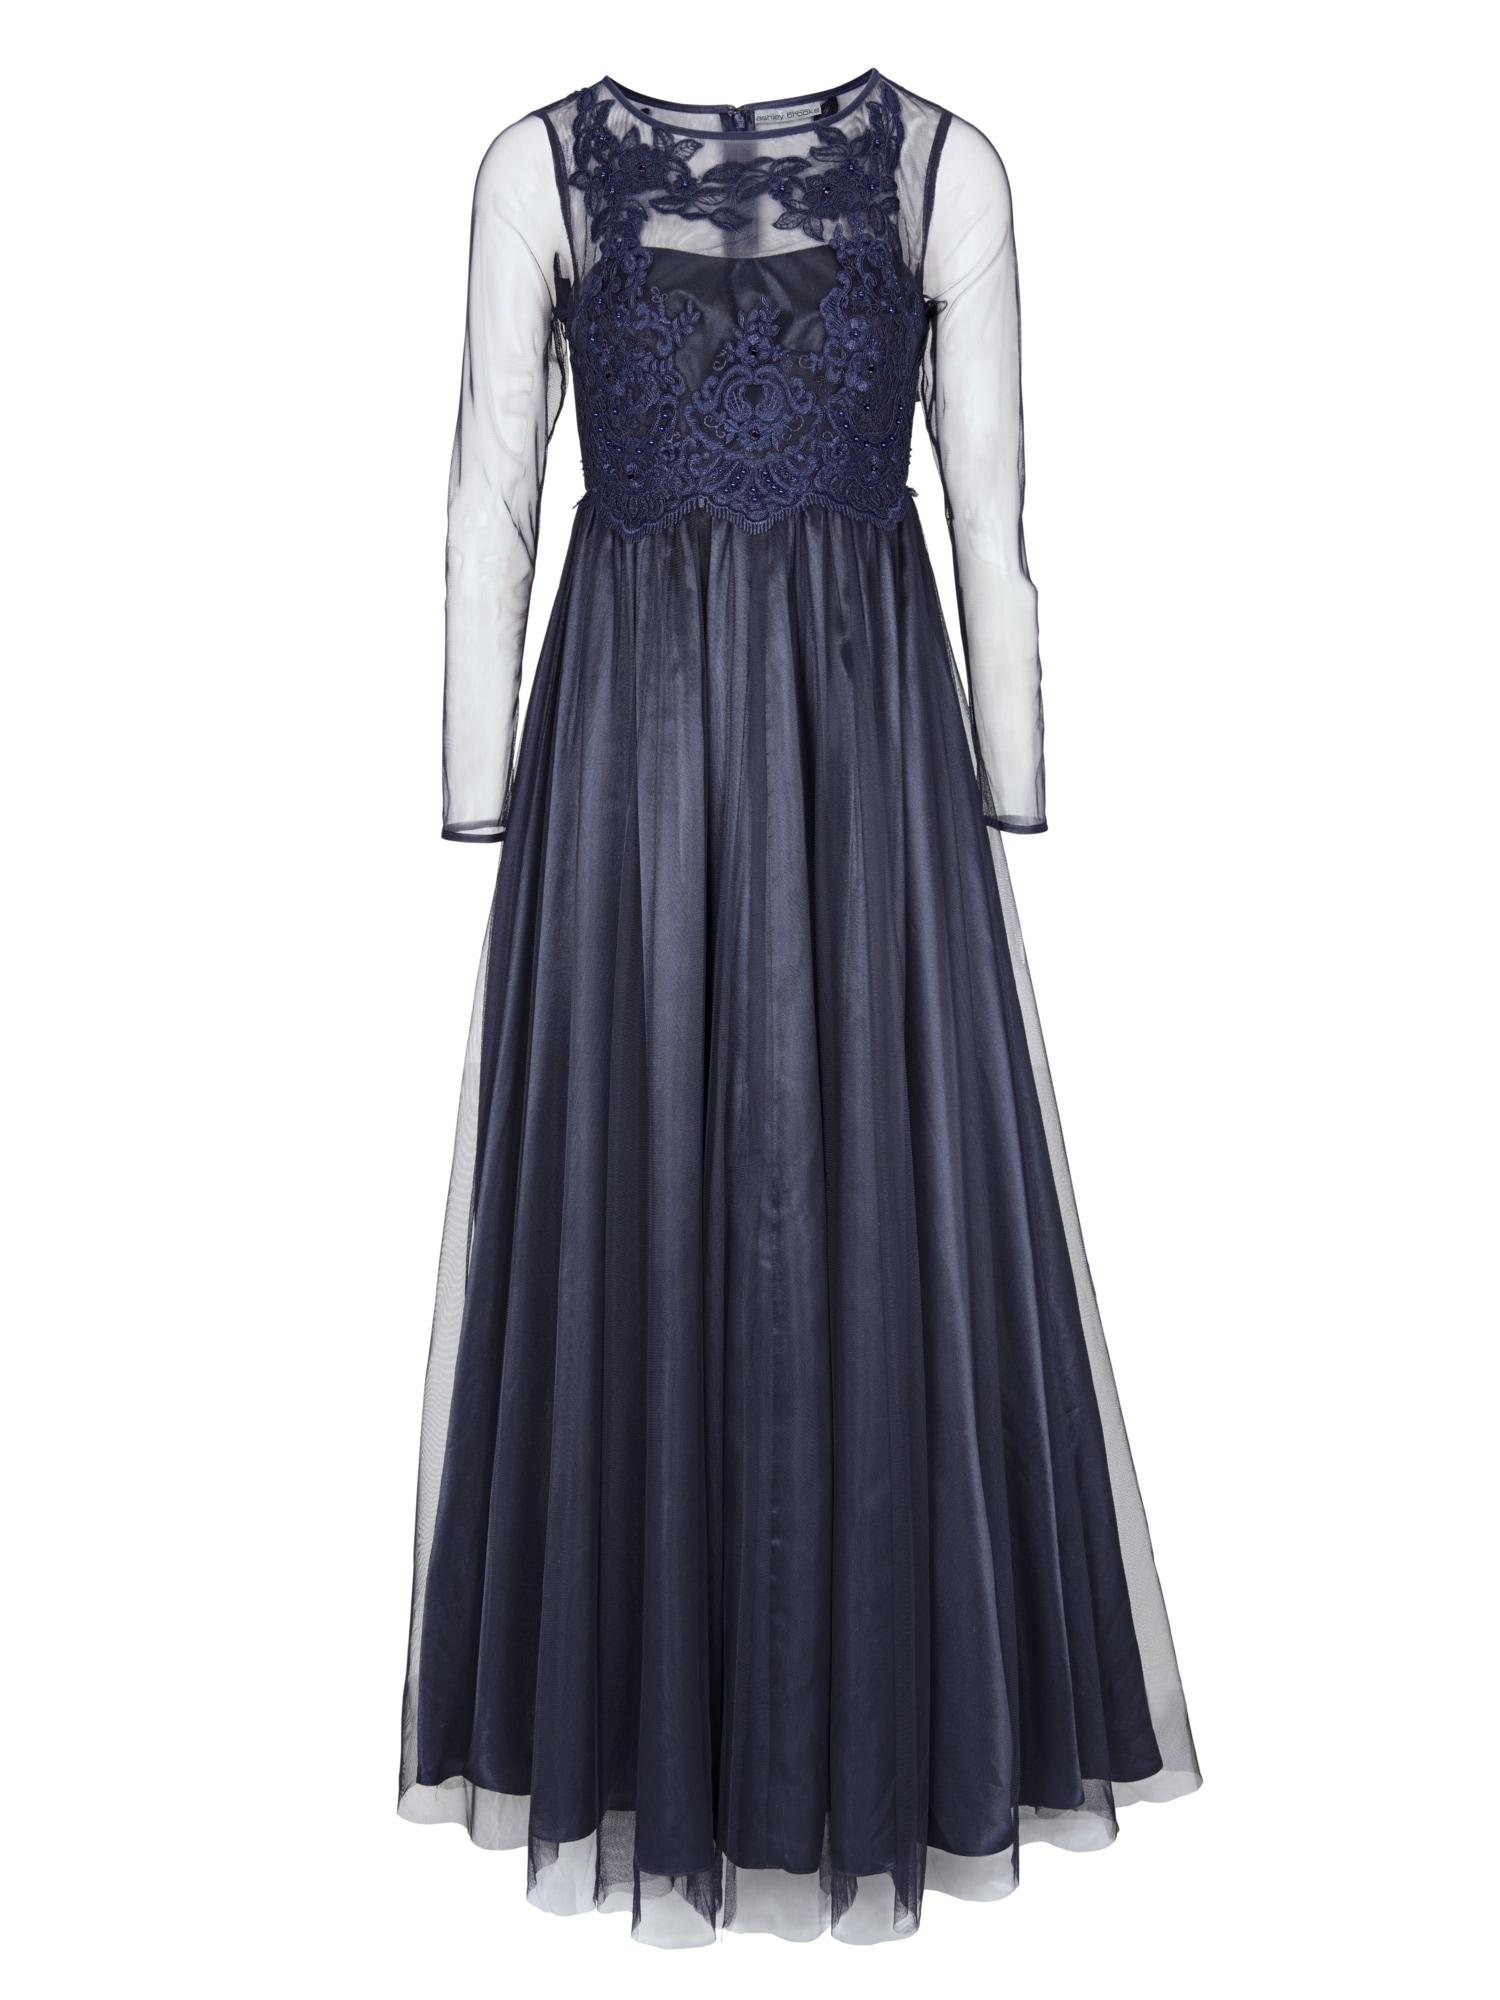 ASHLEY BROOKE by Heine Abendkleid mit Petticoat